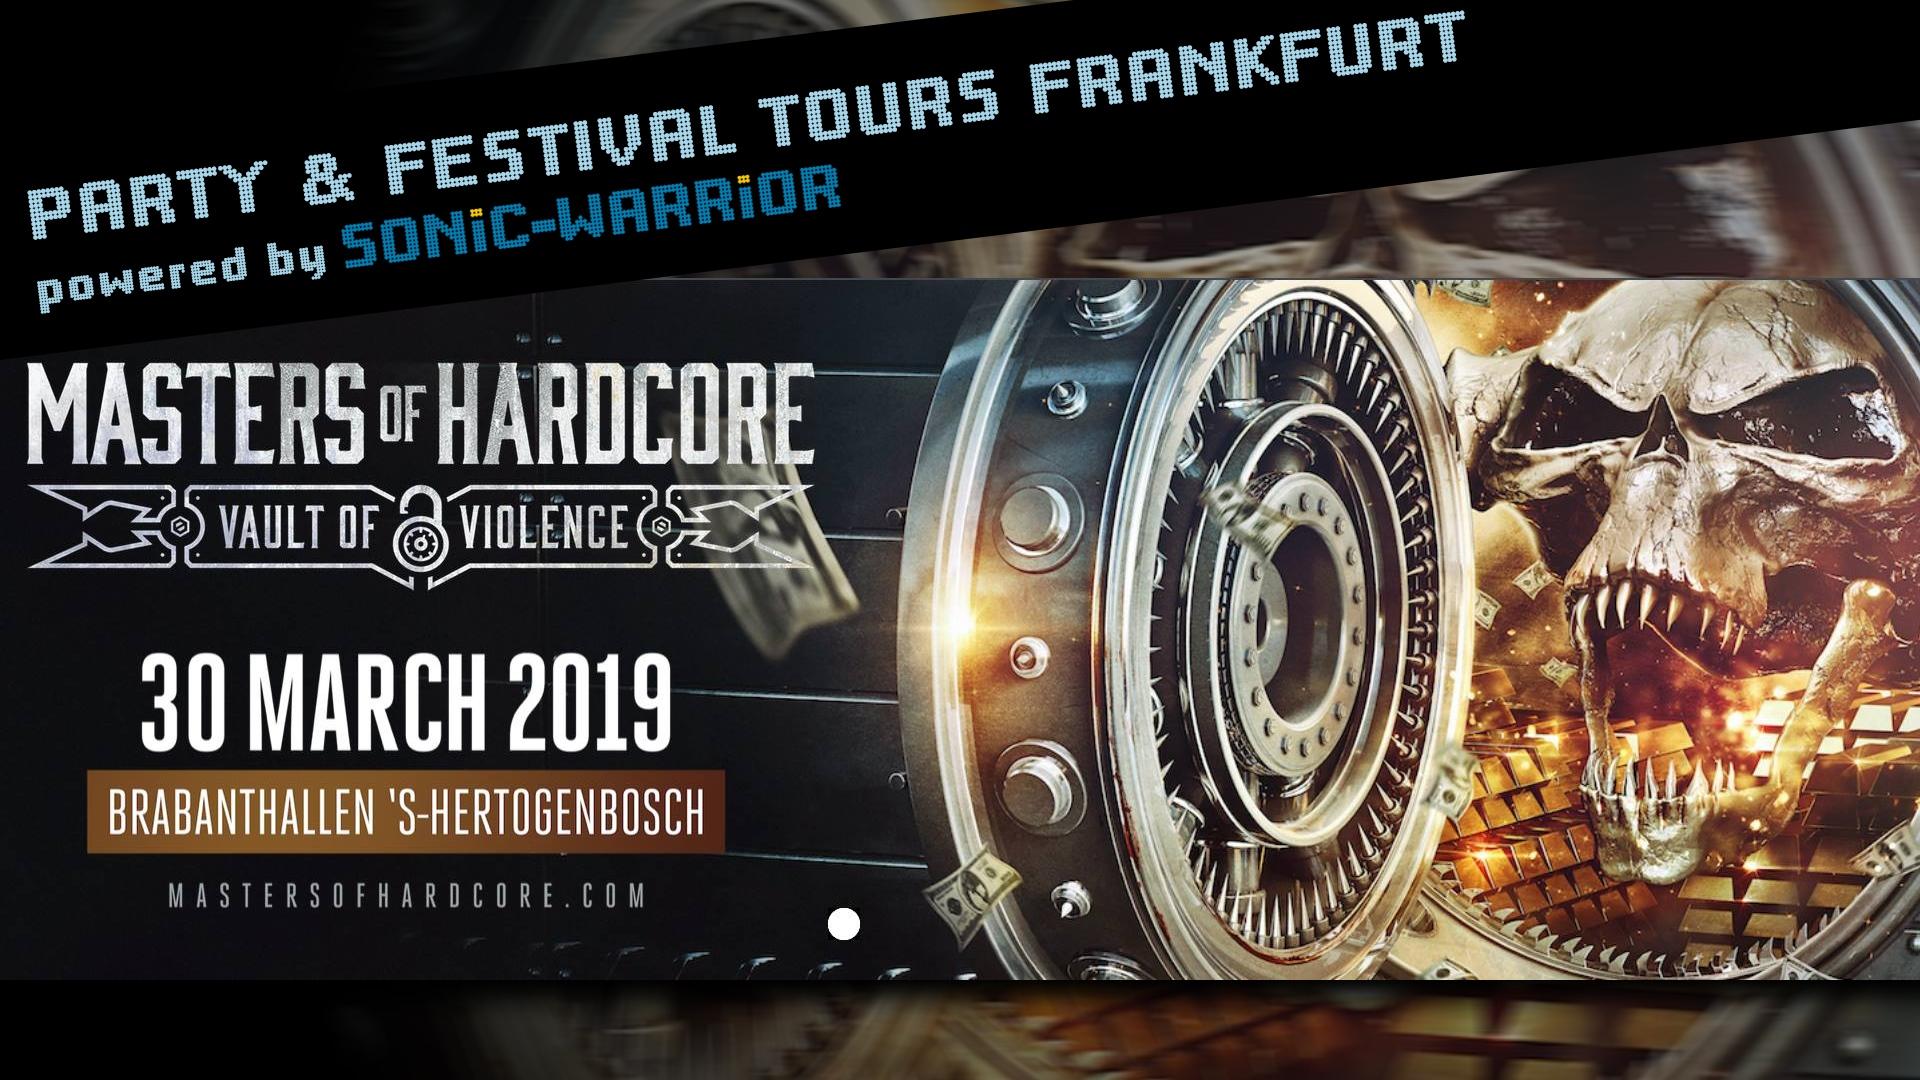 Bus-Tour zur Masters of Hardcore 2019 ab Frankfurt